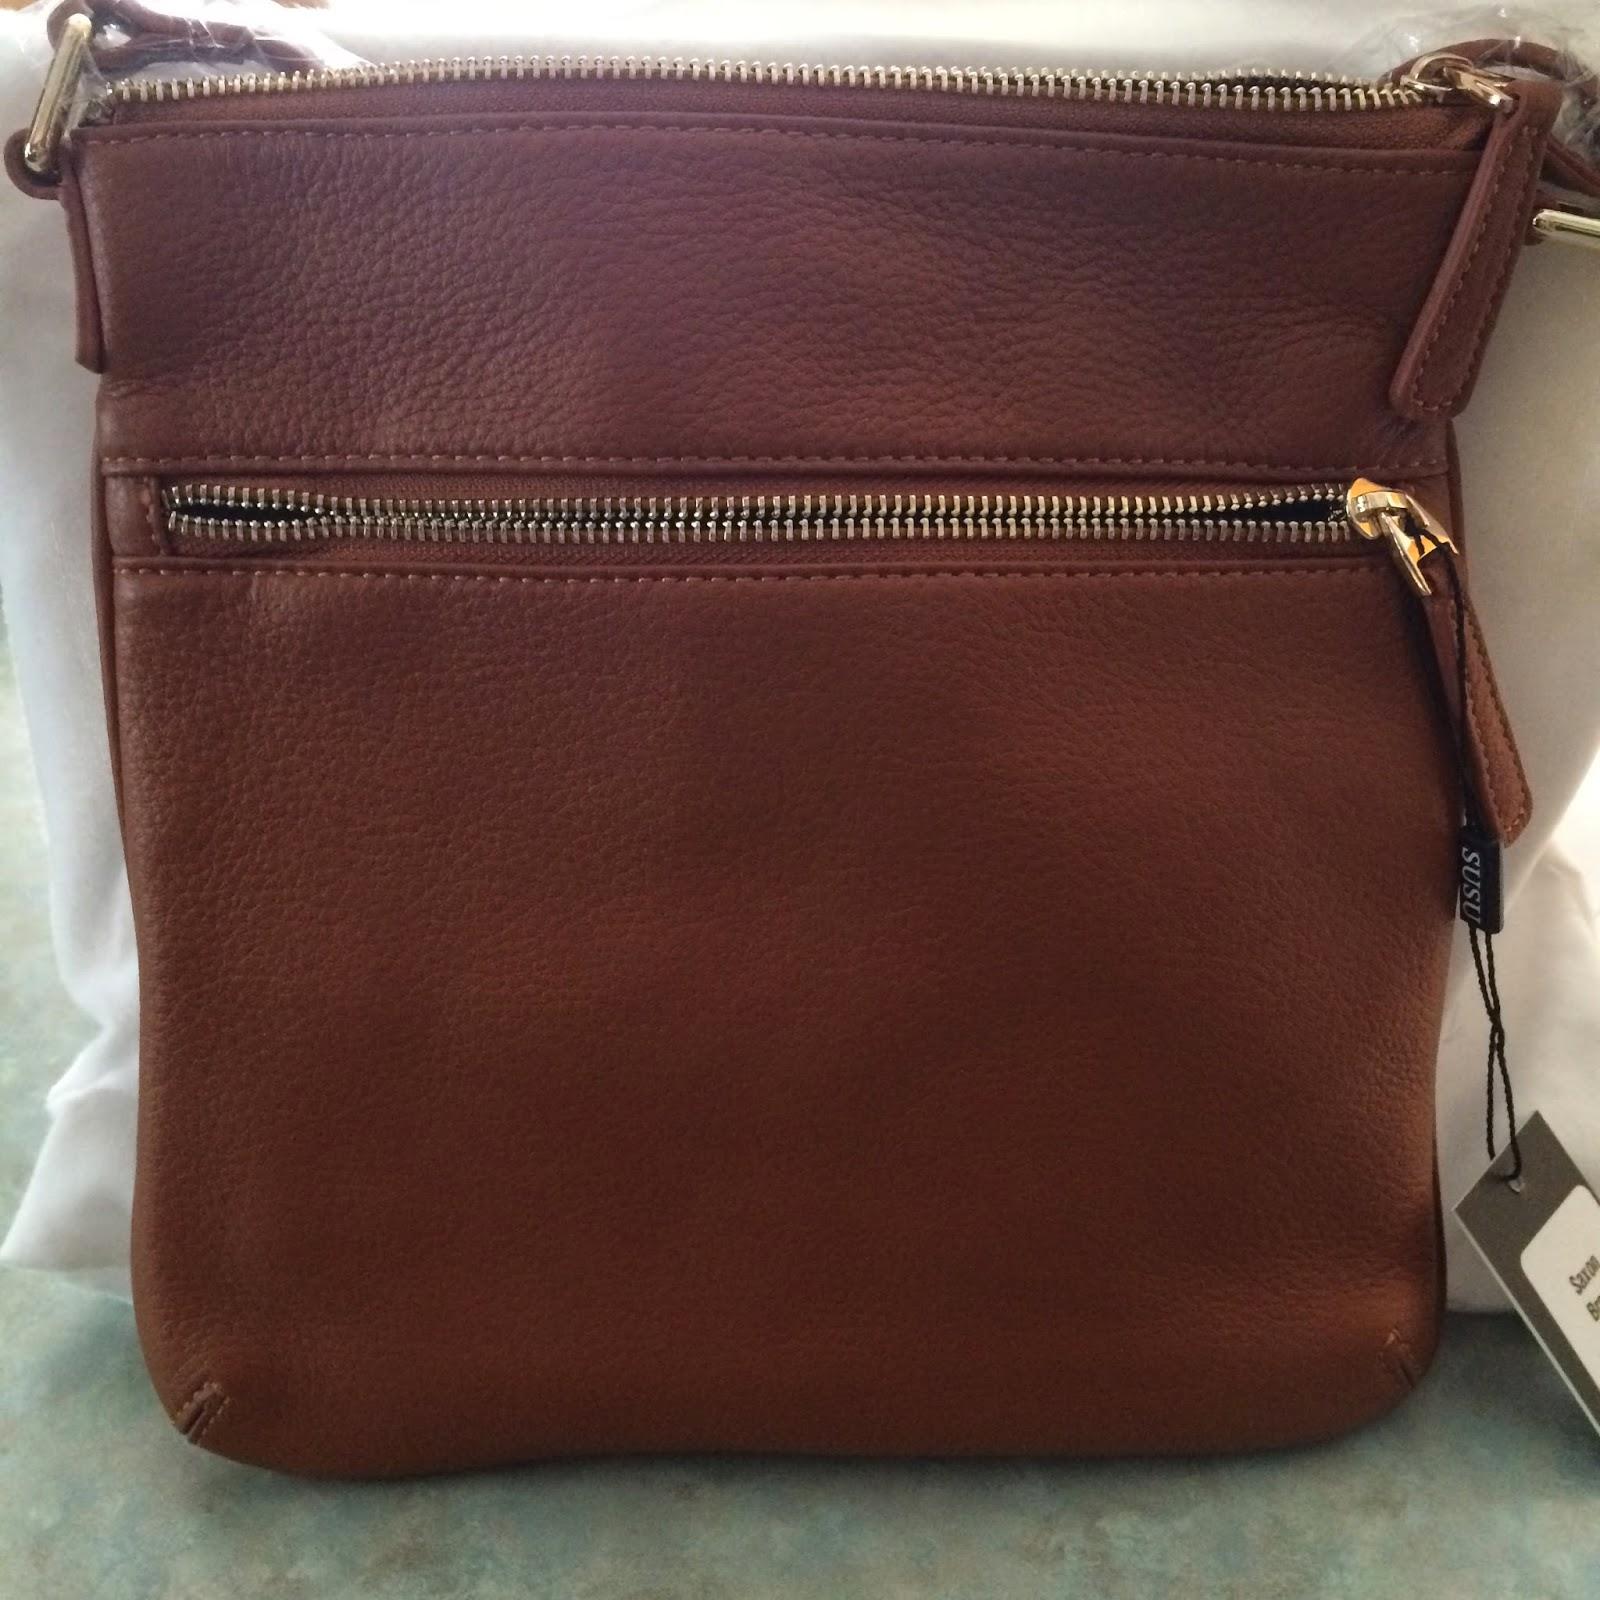 SUSU Saxon Crossbody Handbag #ivysvariety #review